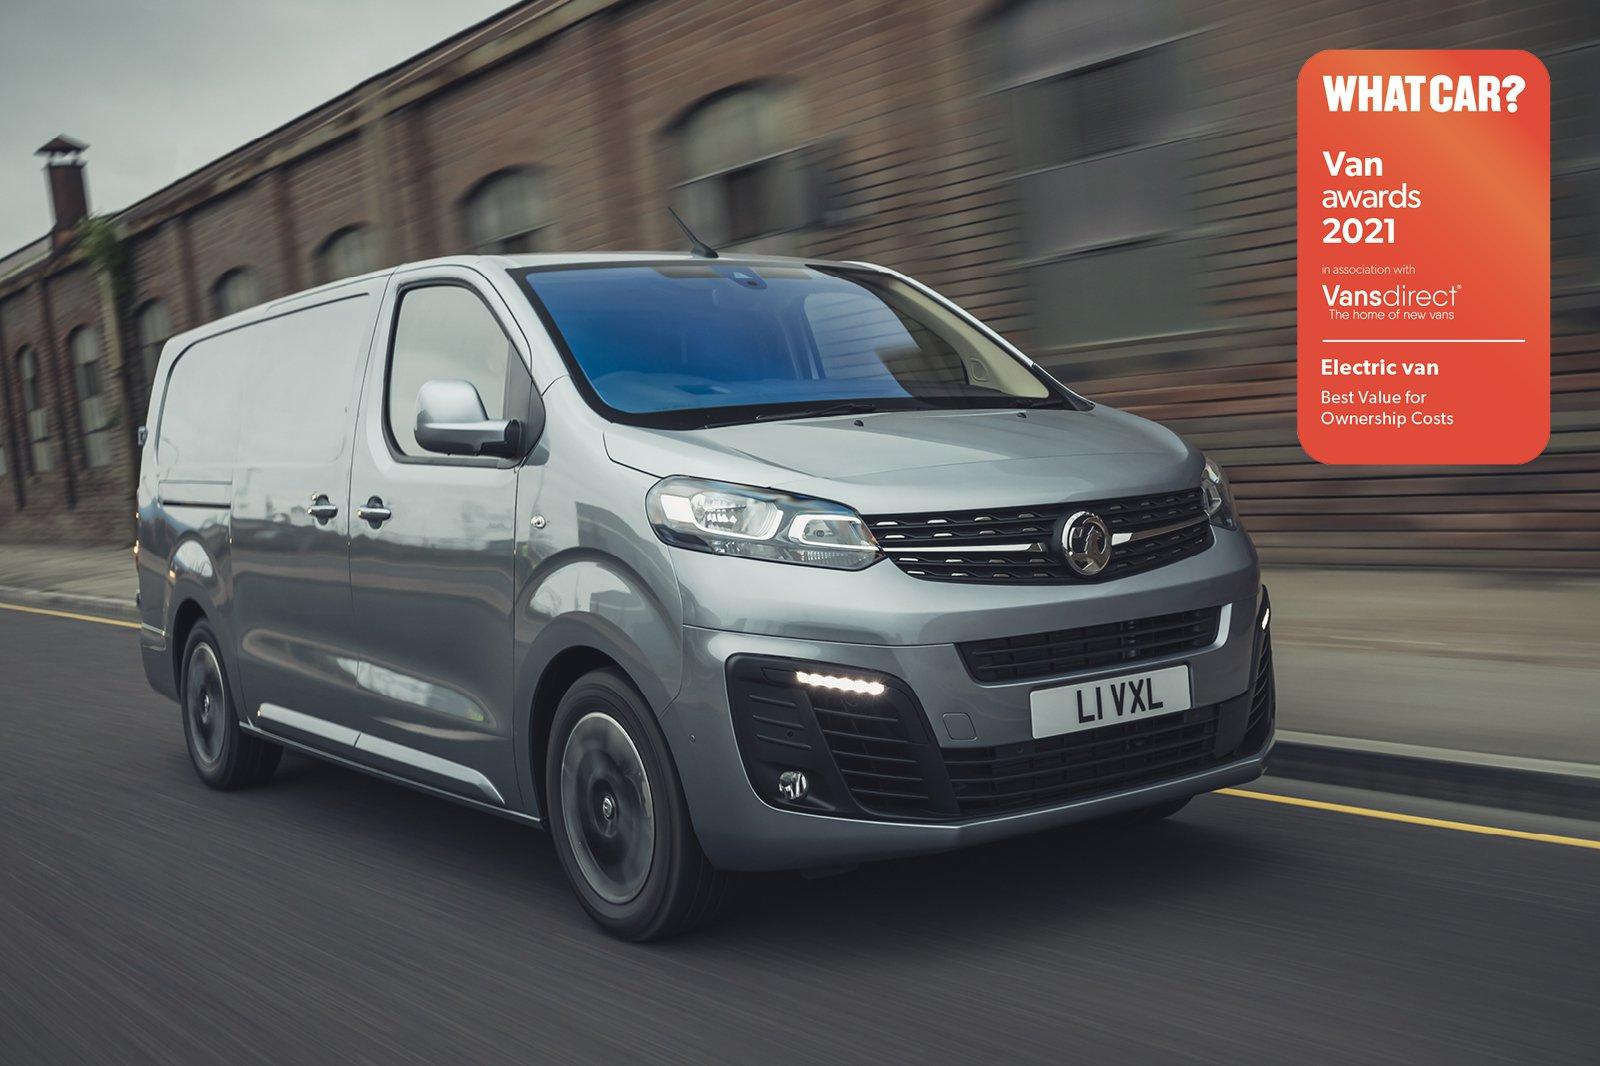 Van Awards 2021 - Electric Van - Best for Ownership Costs (new logo)